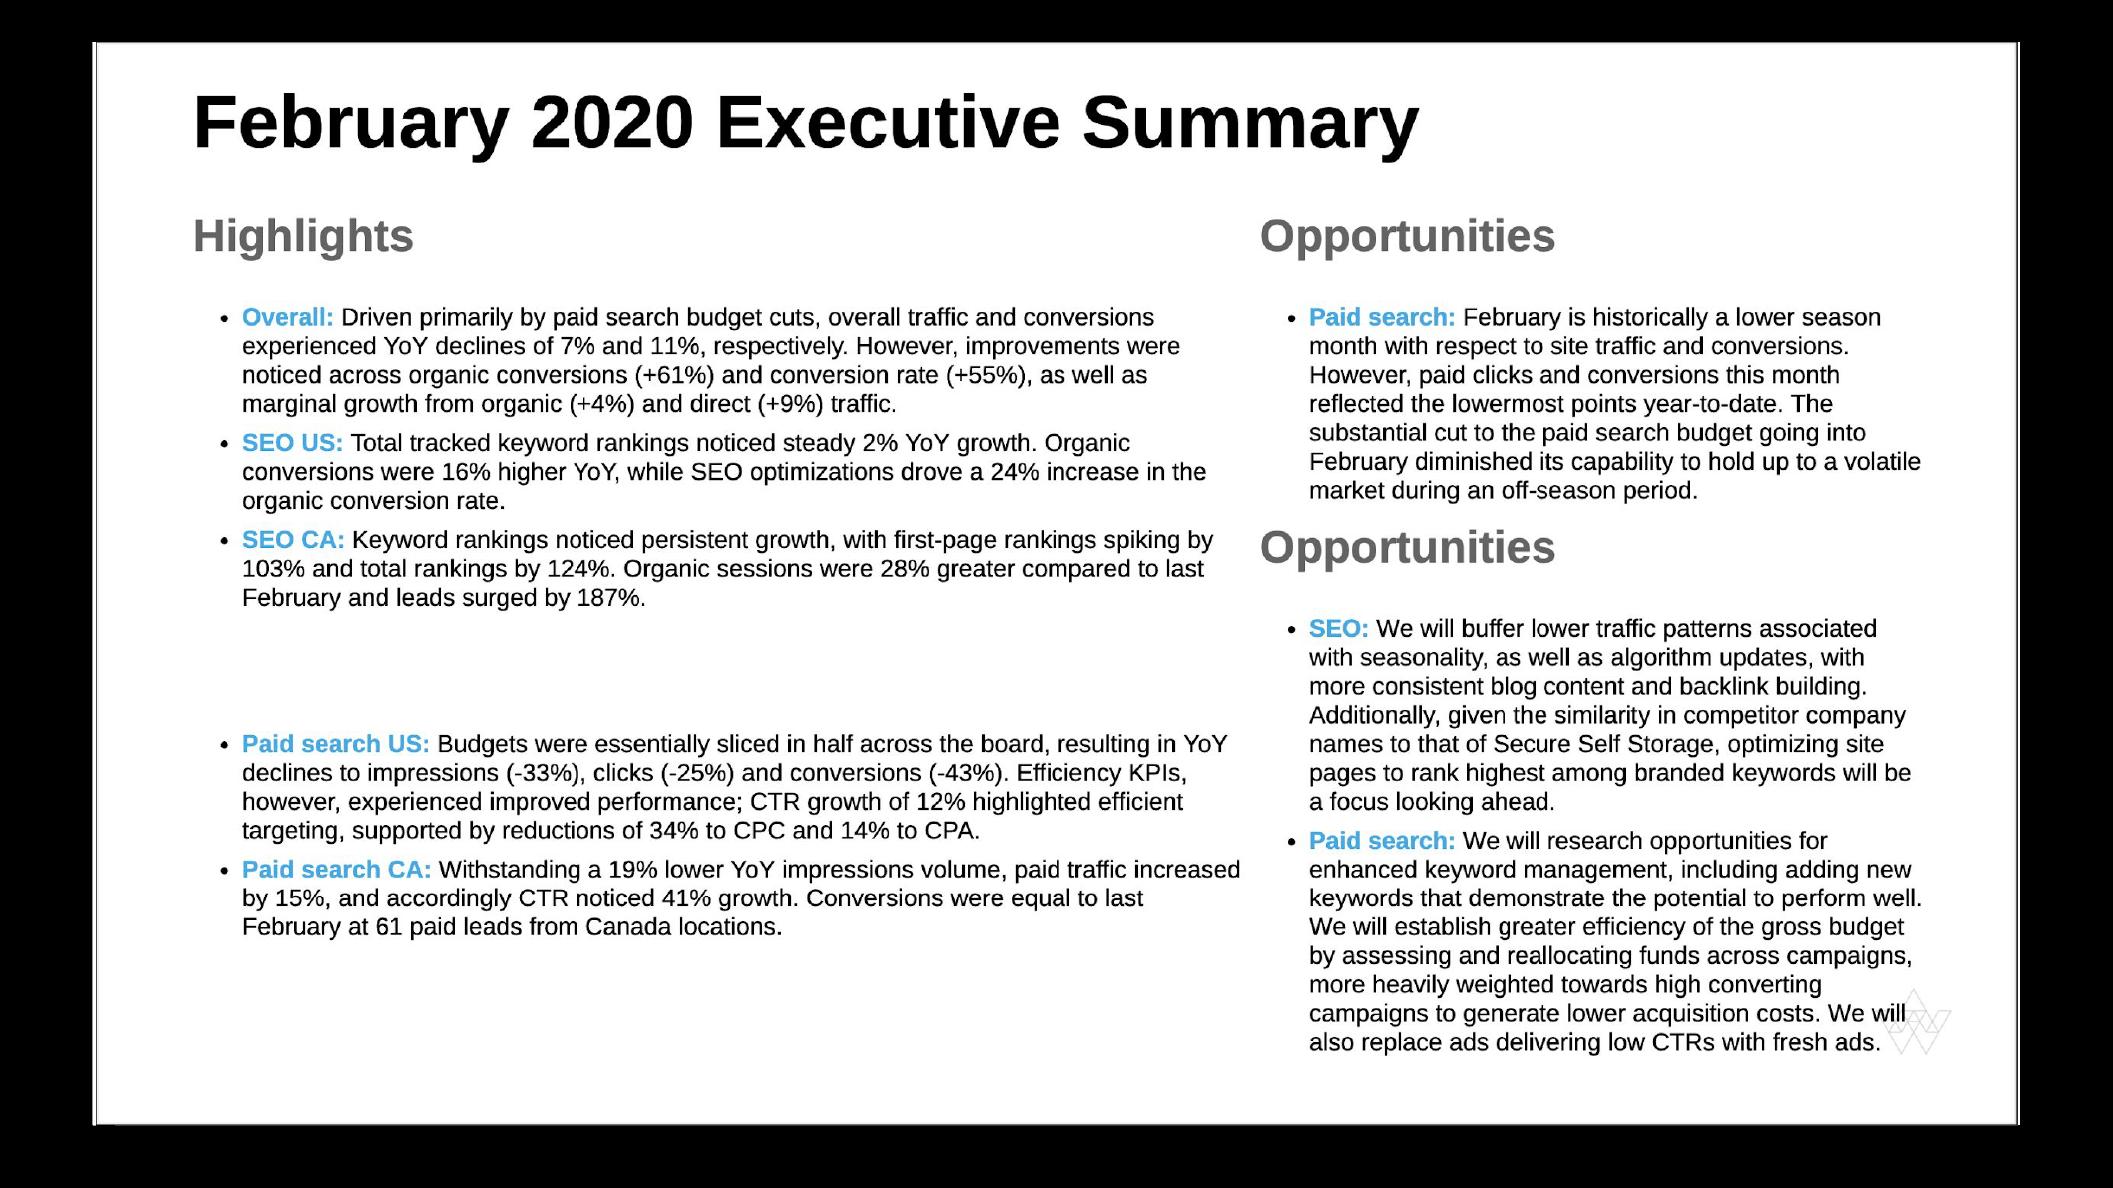 Executive Summary Slide Examples